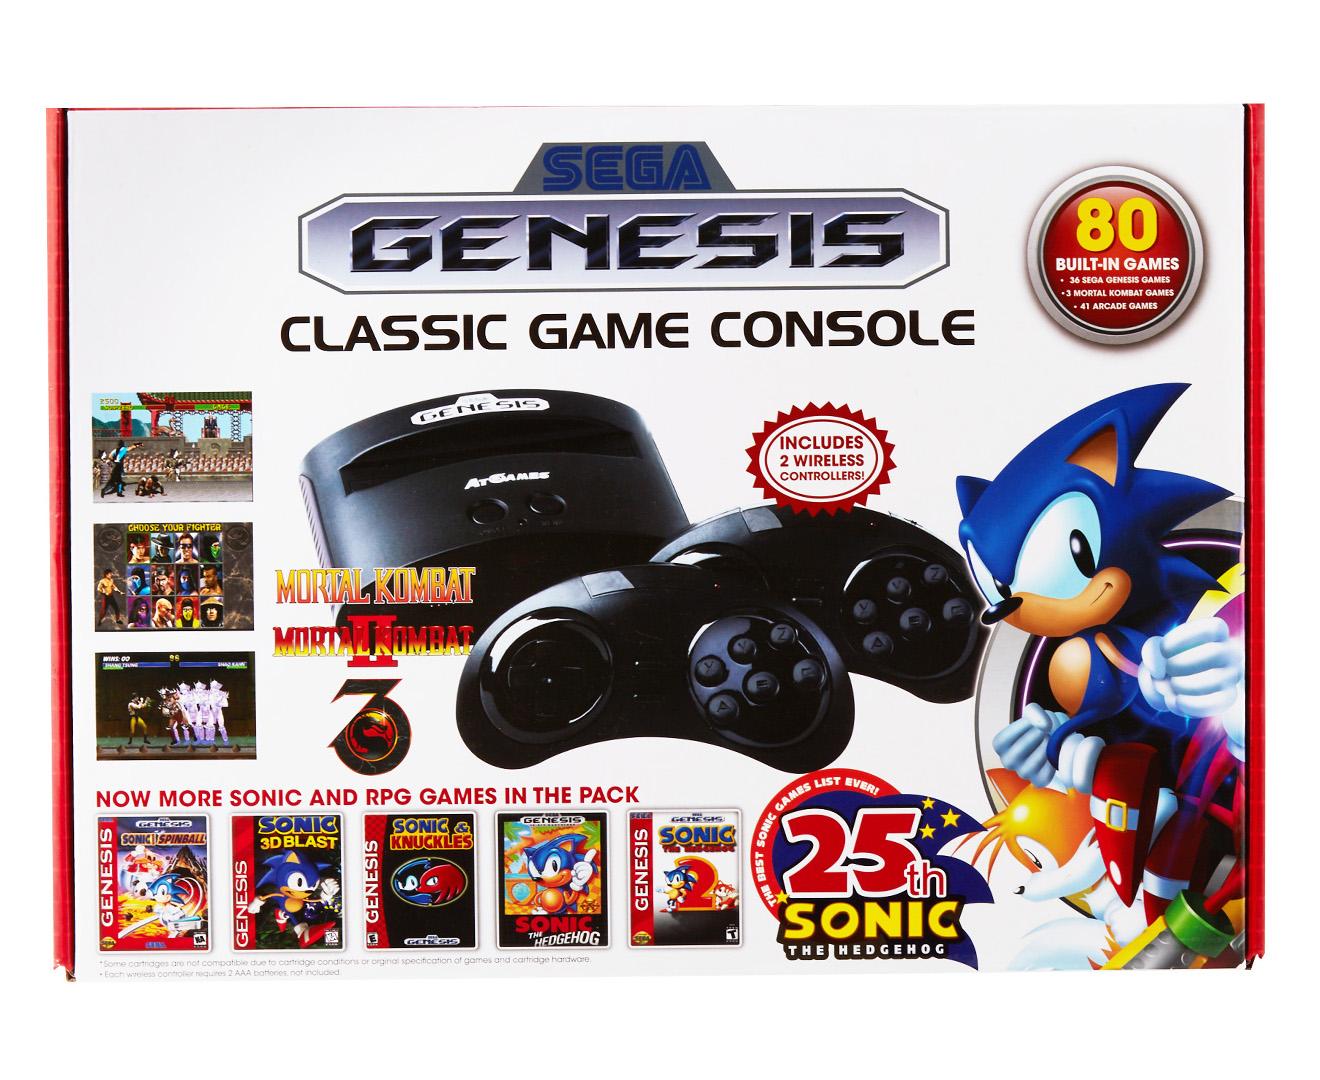 Scoopon shopping sega genesis classic game console w 80 - Sega genesis classic game console game list ...